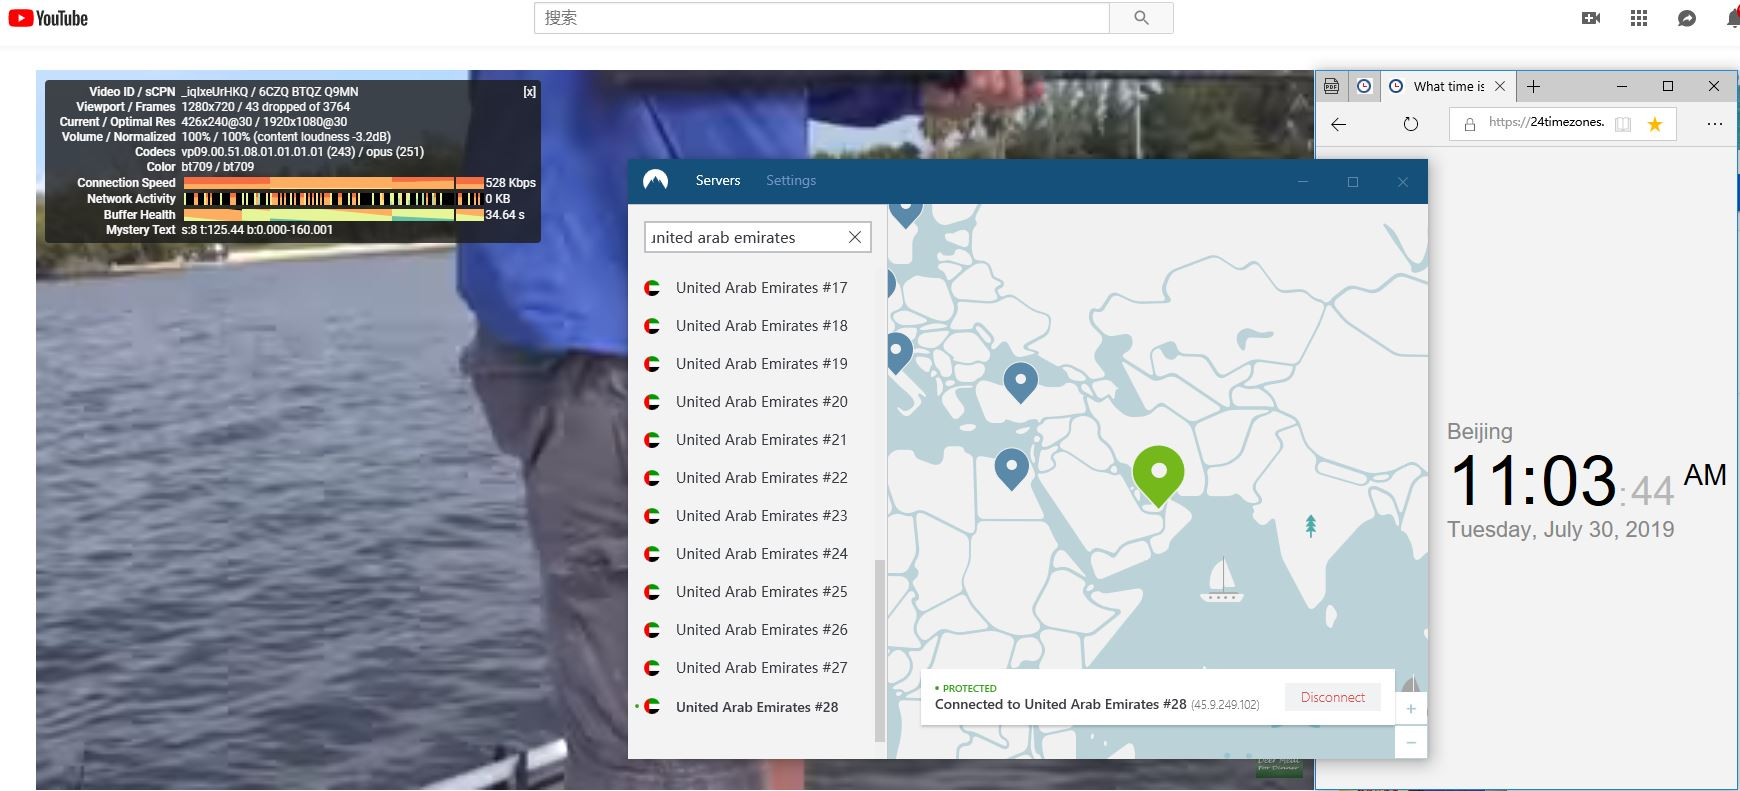 windows-nordvpn-udp协议-阿联酋28服务器-中国翻墙-科学上网-YouTube-20190730